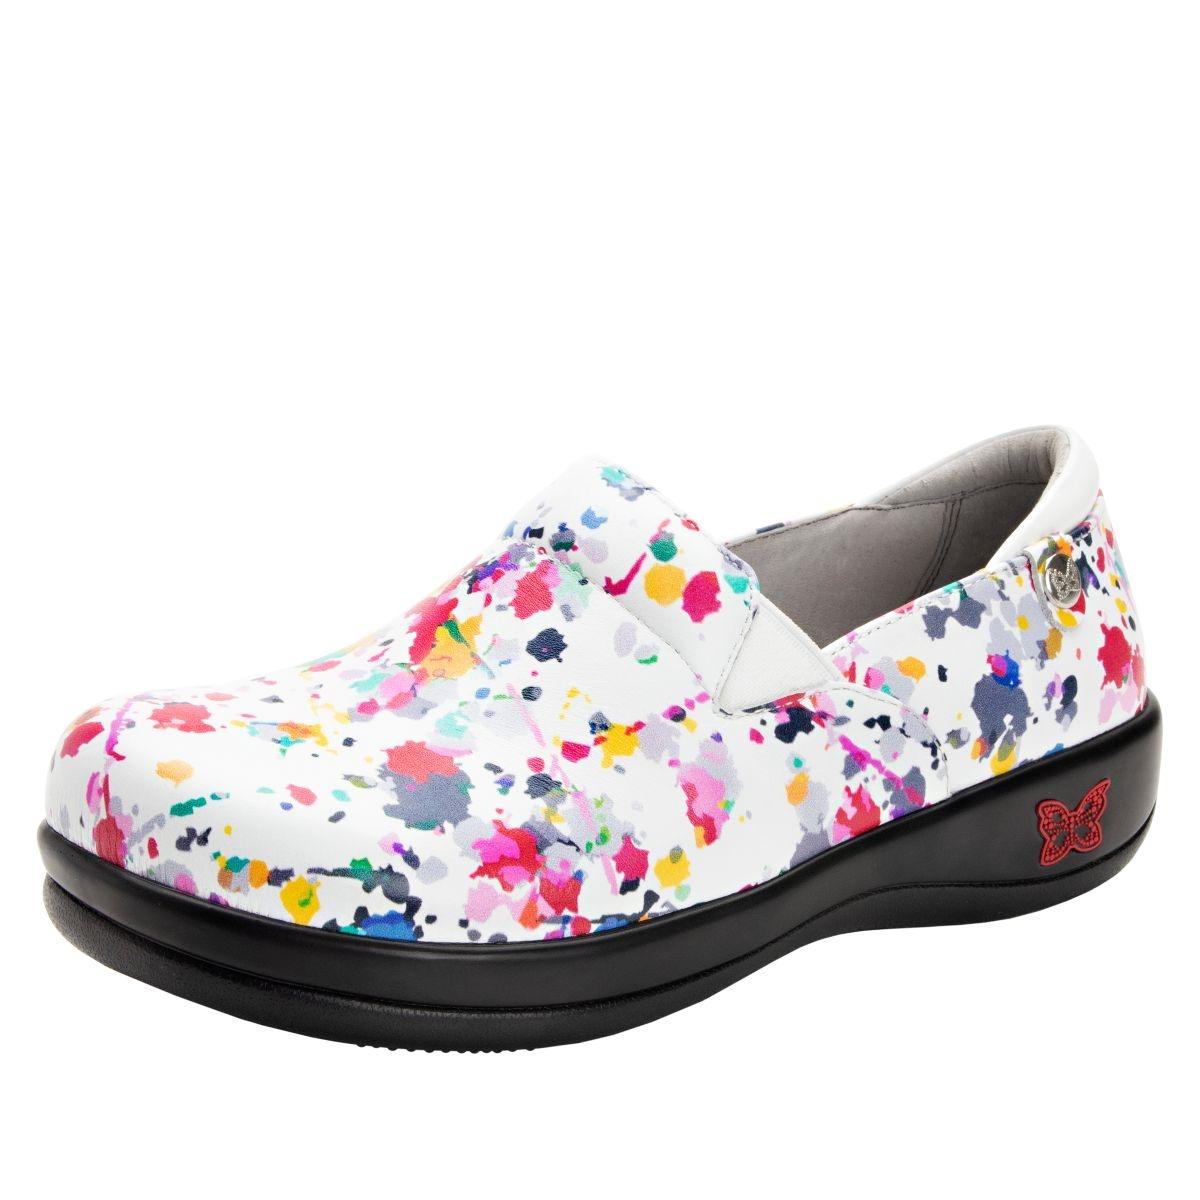 Alegria Shoes - Alegria Keli Pollack